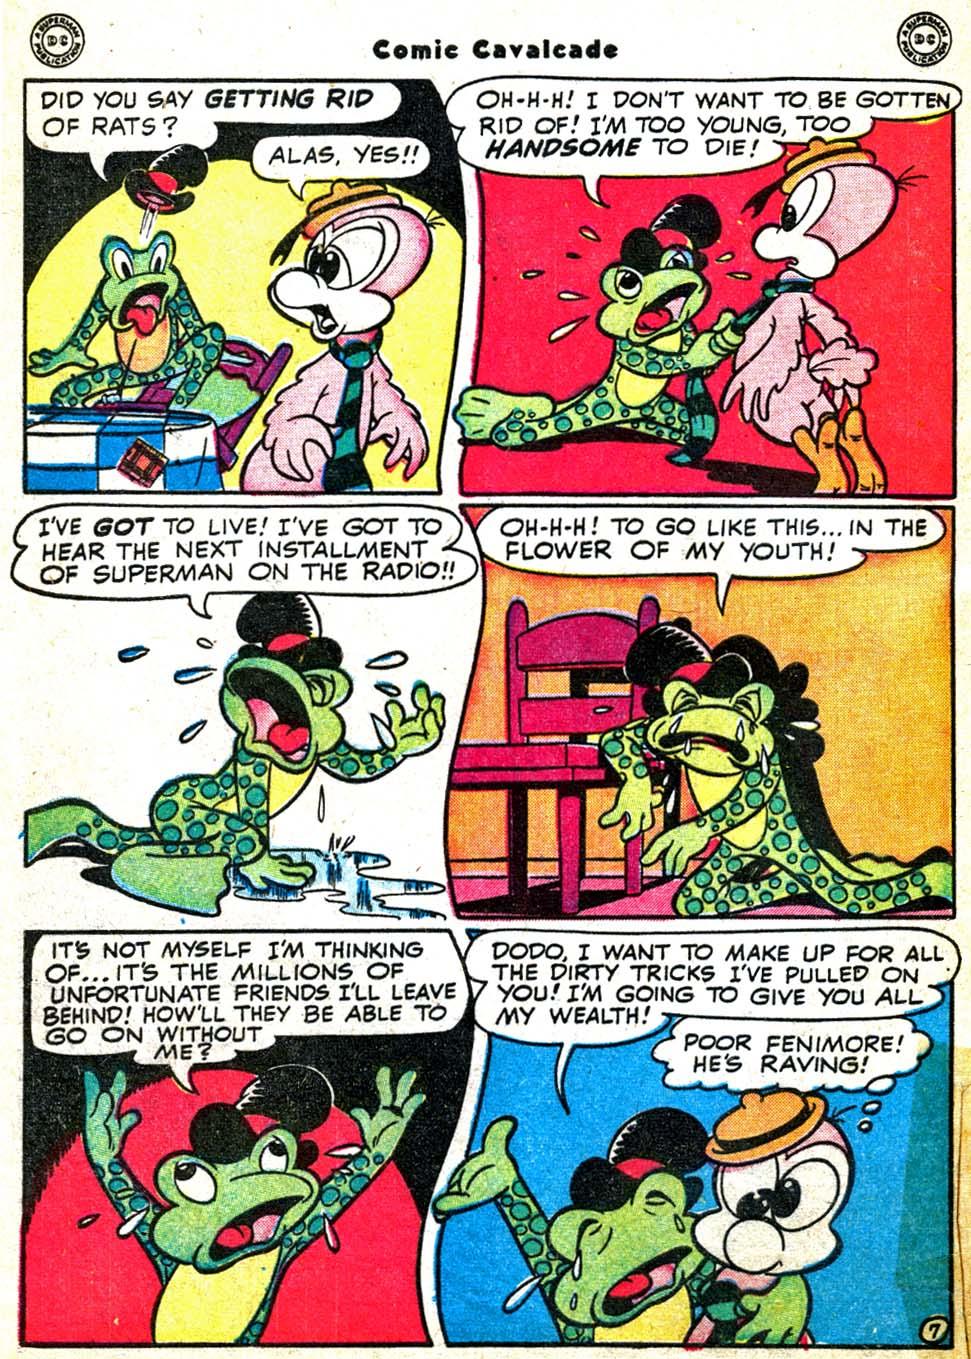 Comic Cavalcade issue 31 - Page 72